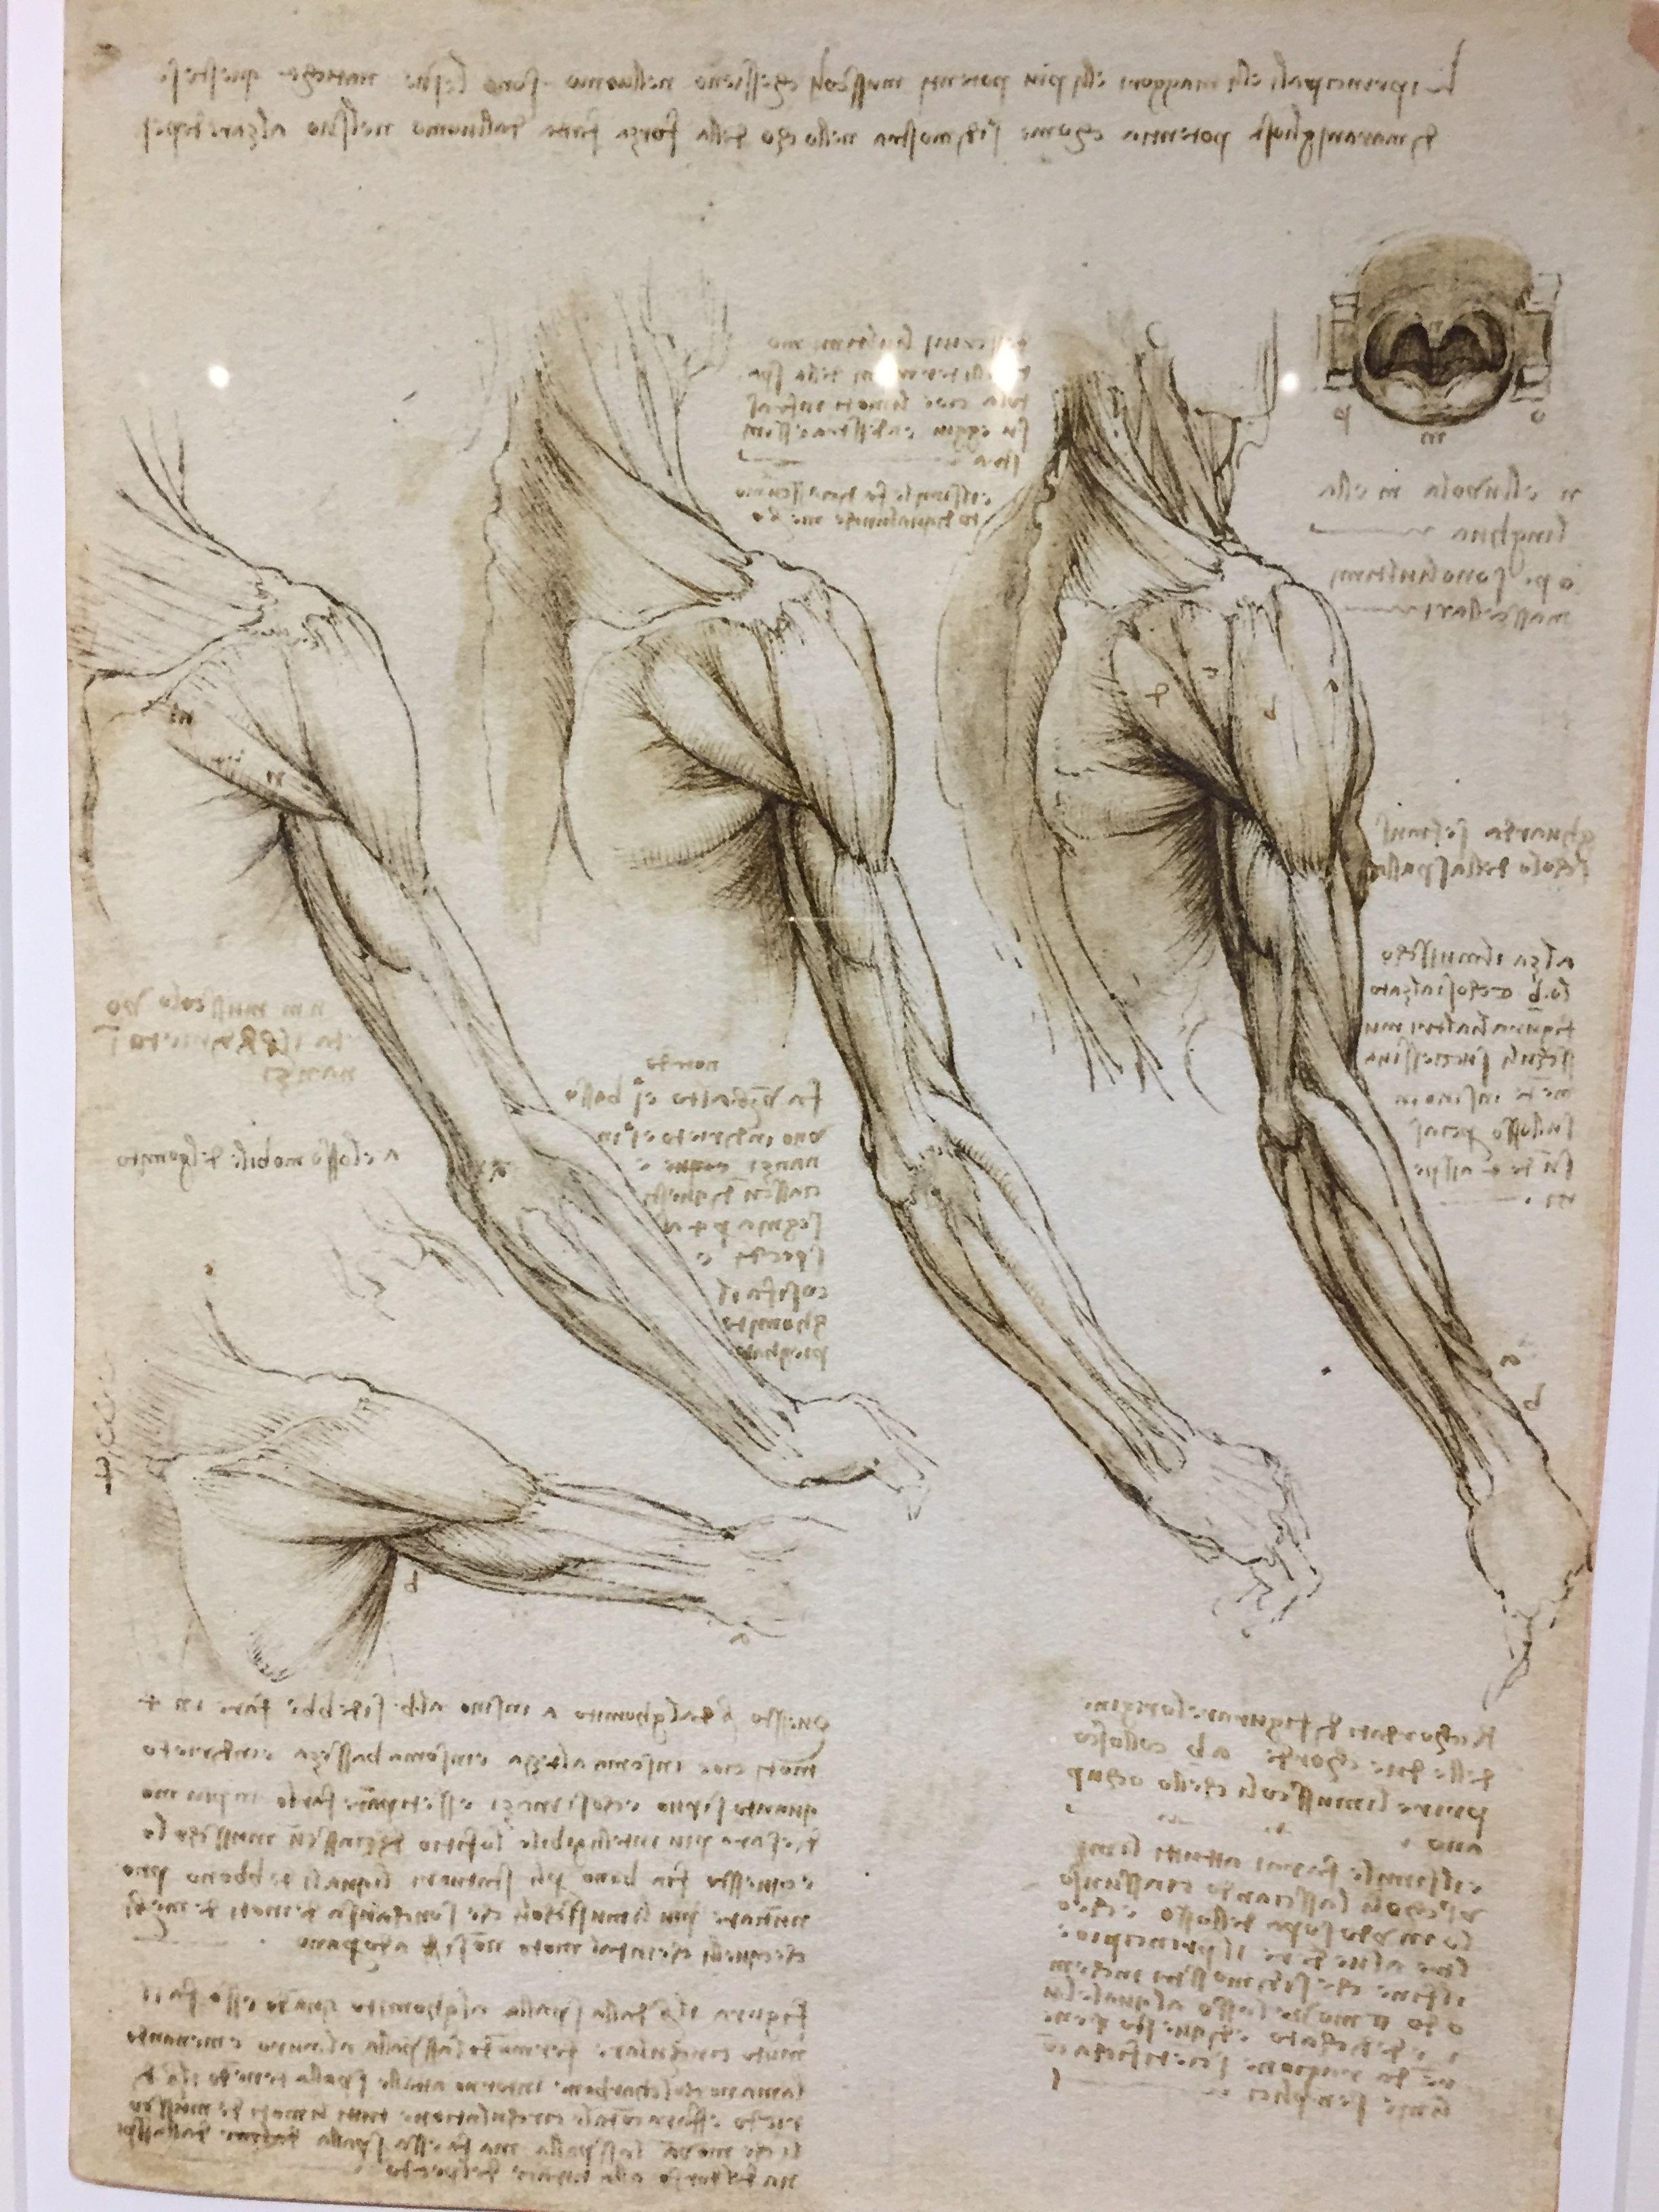 Pin von Peace and Positivity auf Leonardo Da Vinci | Pinterest